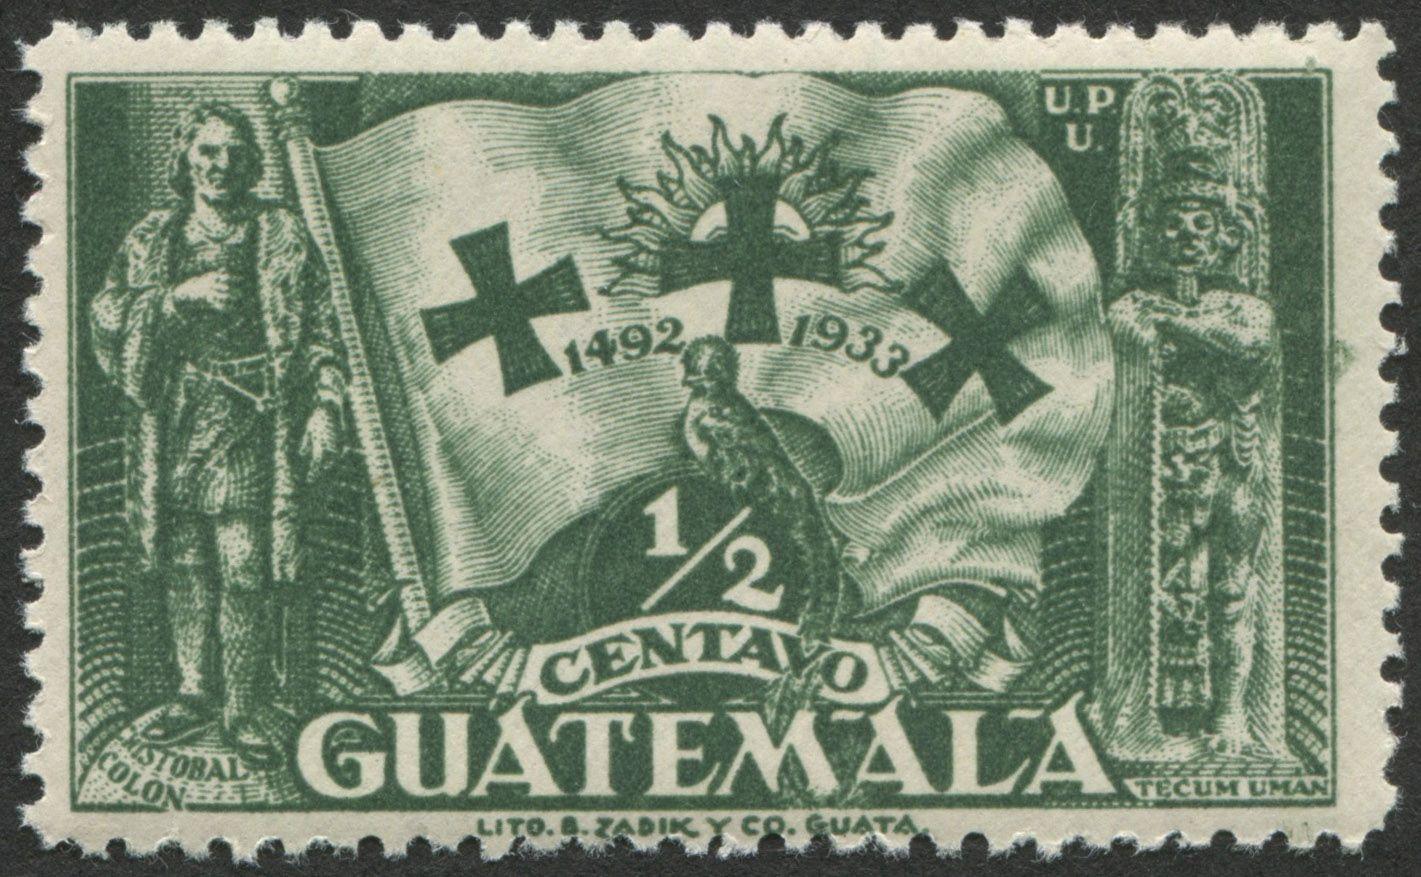 Guatemala Scott 259 03 Aug 1933 Flag Of The Race Christopher Columbus And Tecum Uman Monument From Set Of 5 Stamps Christopher Columbus Stamp Philately